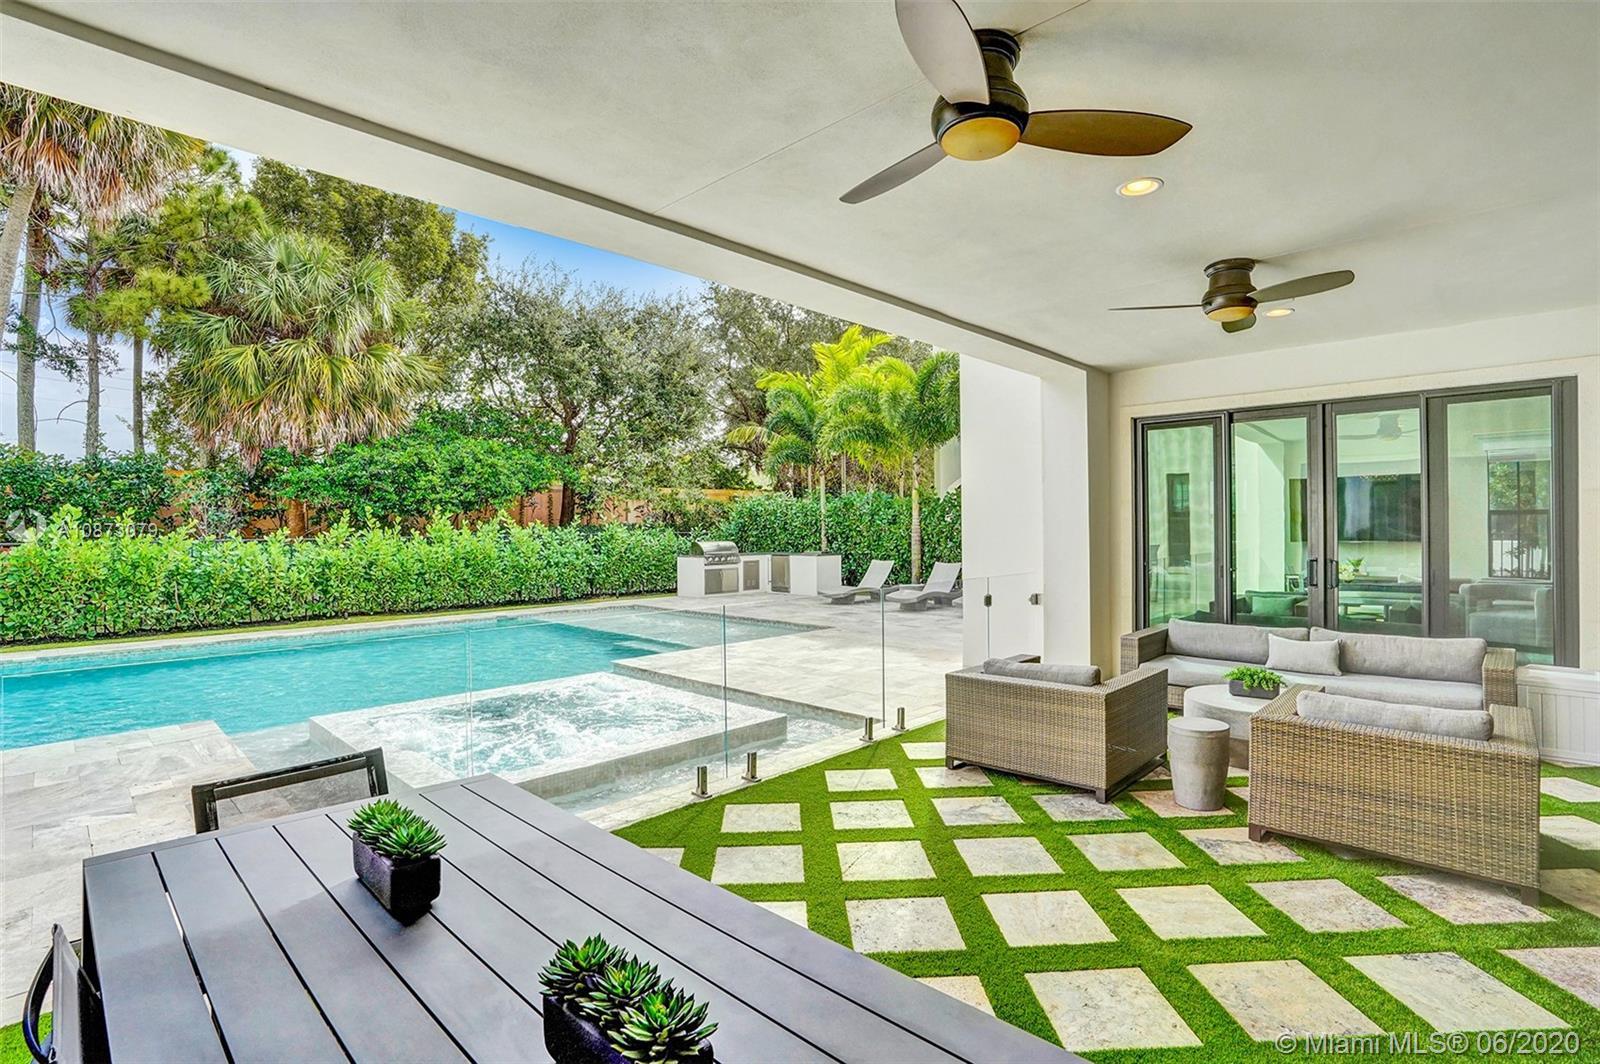 image #1 of property, Oaks At Boca Raton 8